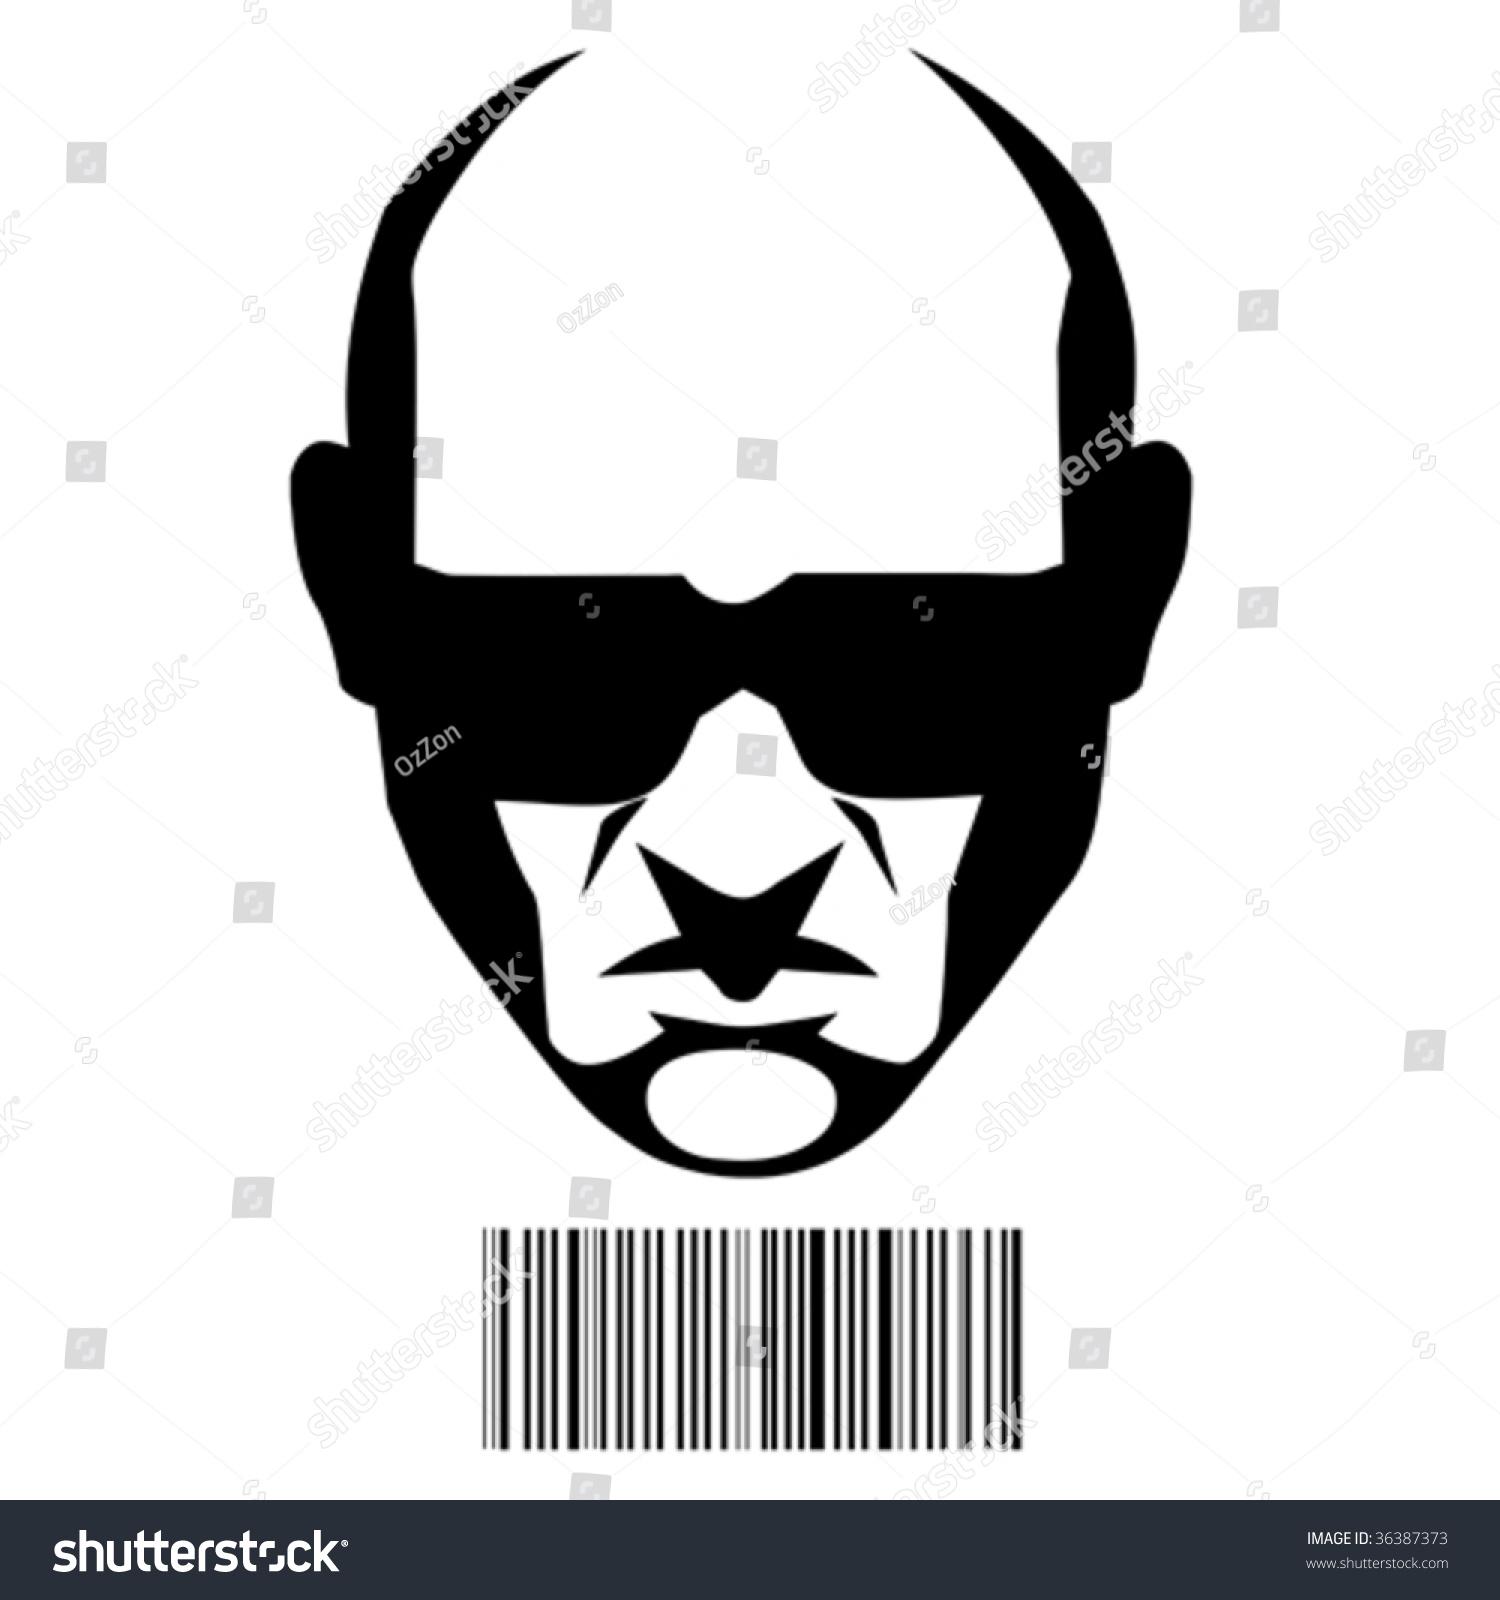 hitman face barcode identification stock vector royalty free